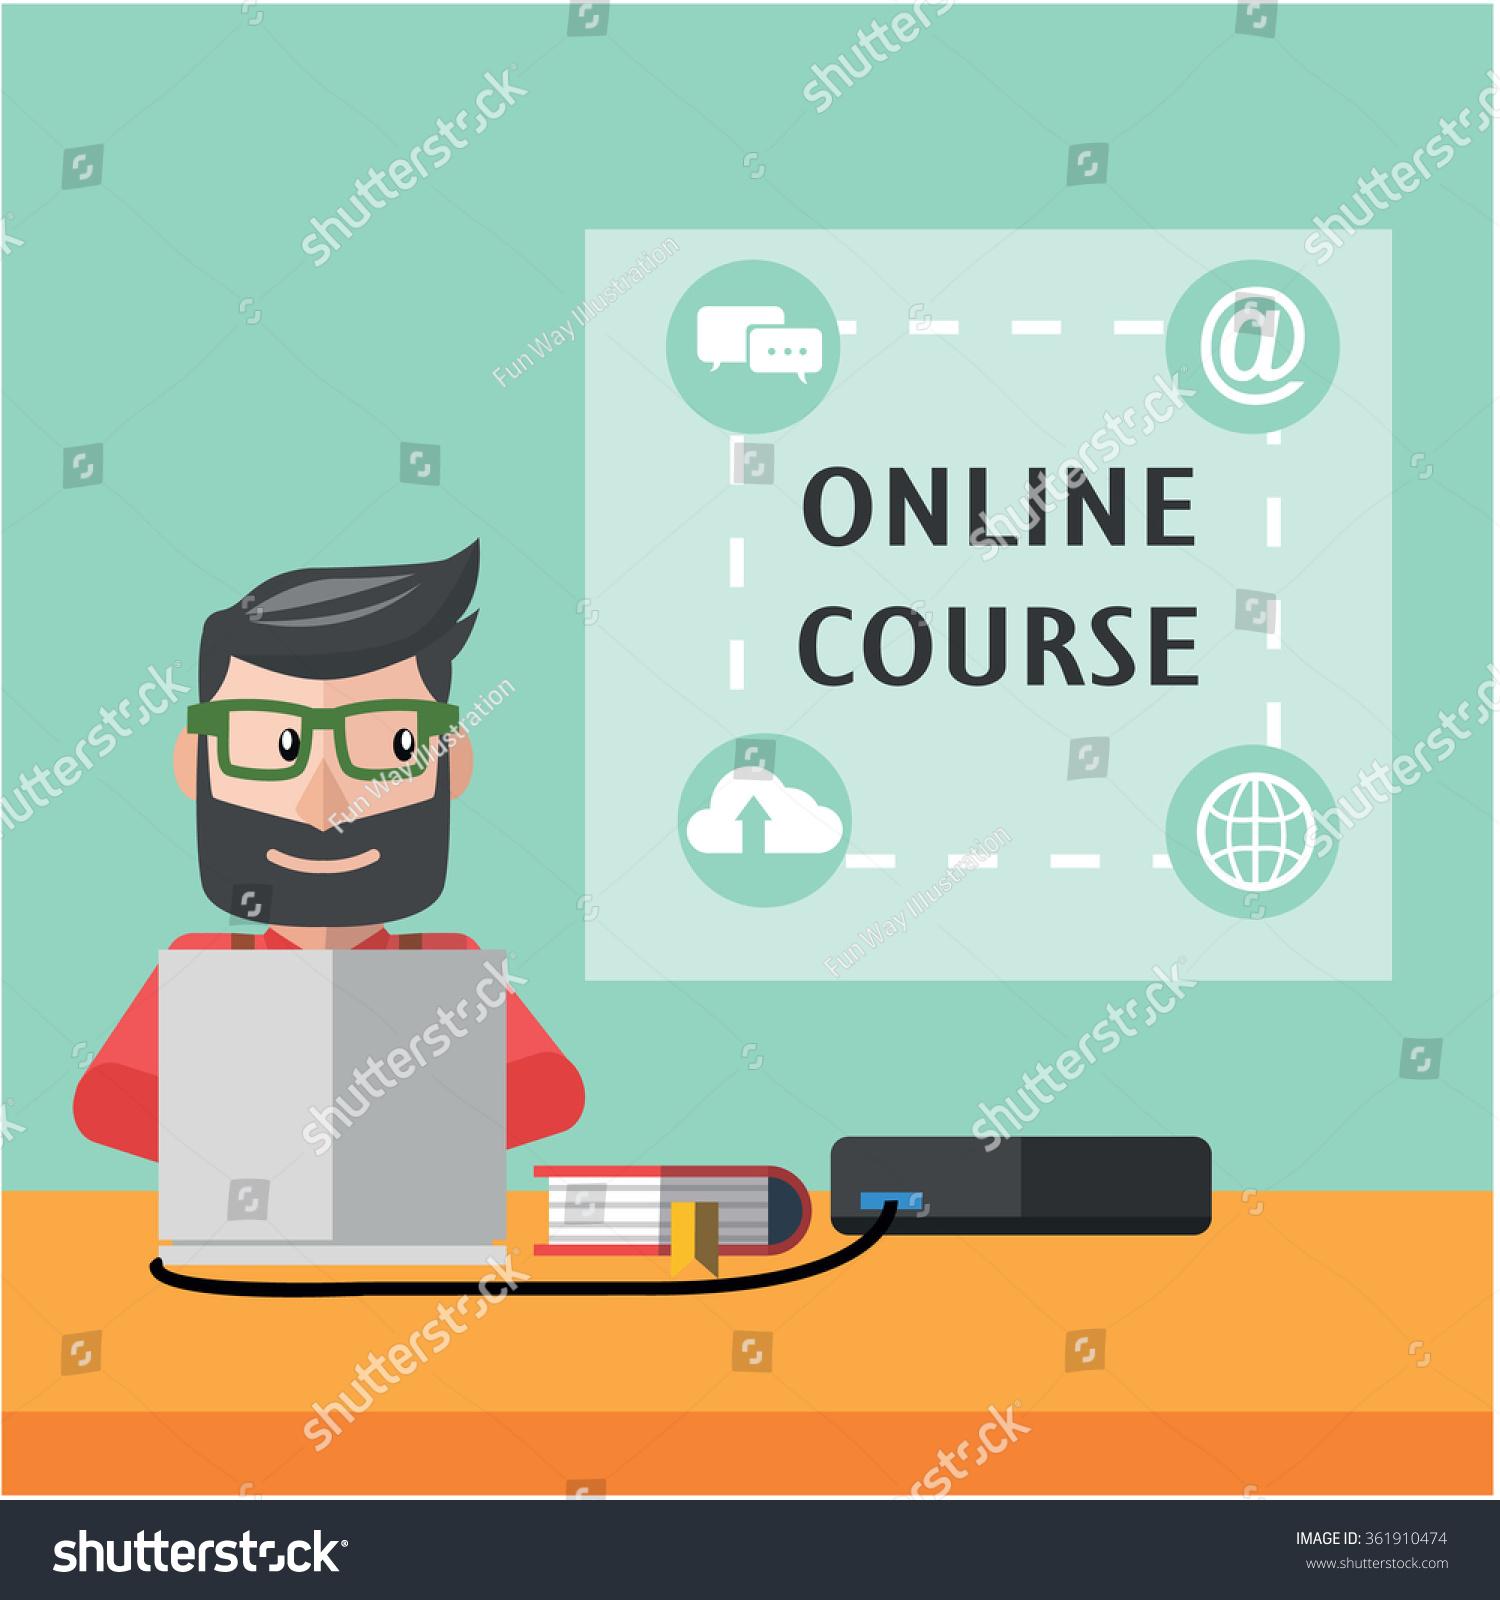 Color on online - Online Course Flat Color Cartoon Illustration